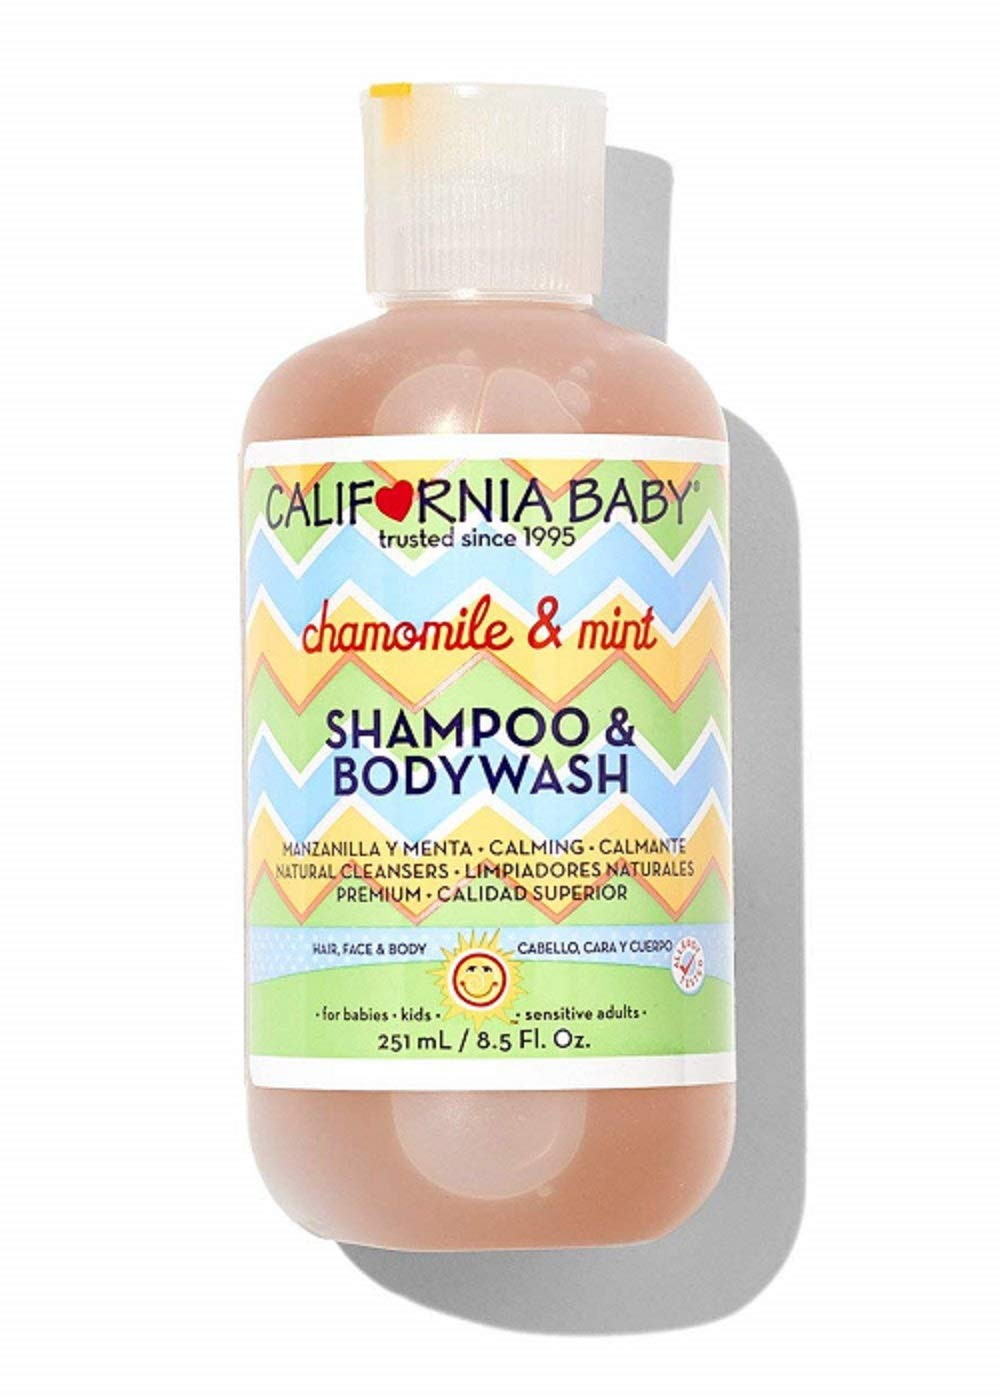 California Baby Chamomile & Mint Shampoo & Bodywash- 8.5 oz CB-207